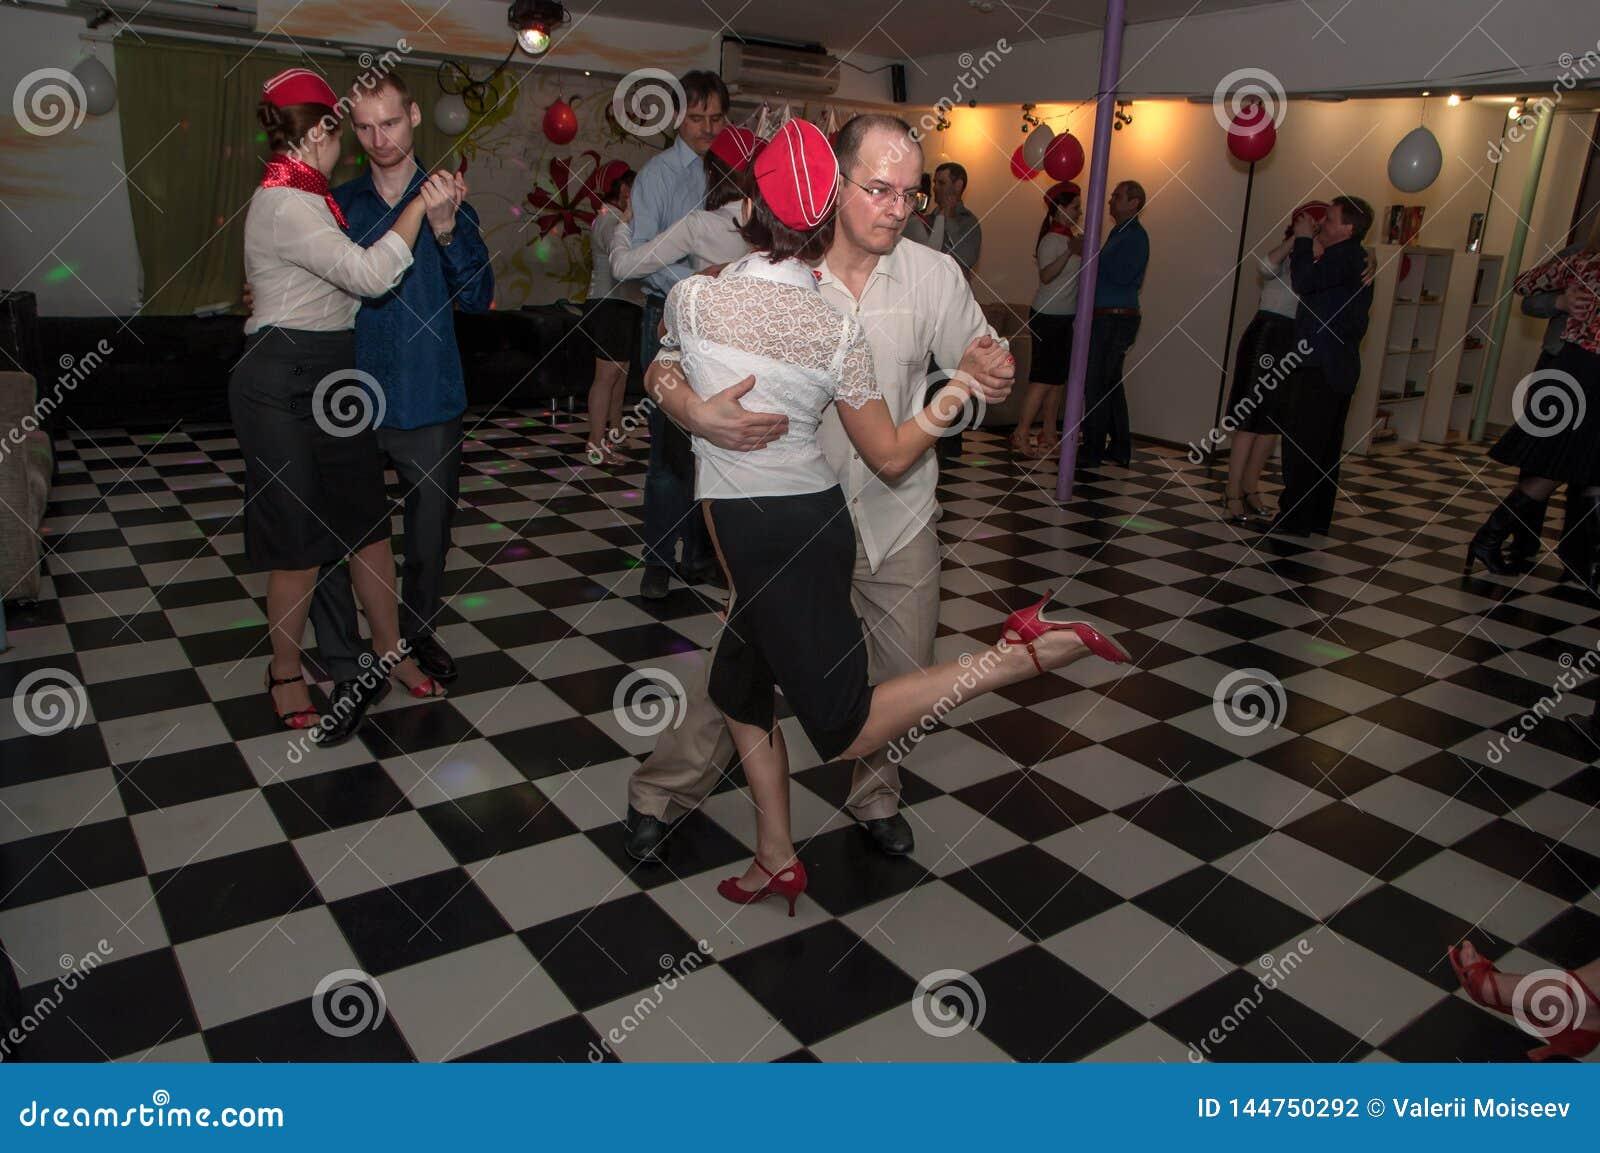 Russia, Ryazan - 20 Feb 2017 - Some happy couples dancing tango in dancing studio